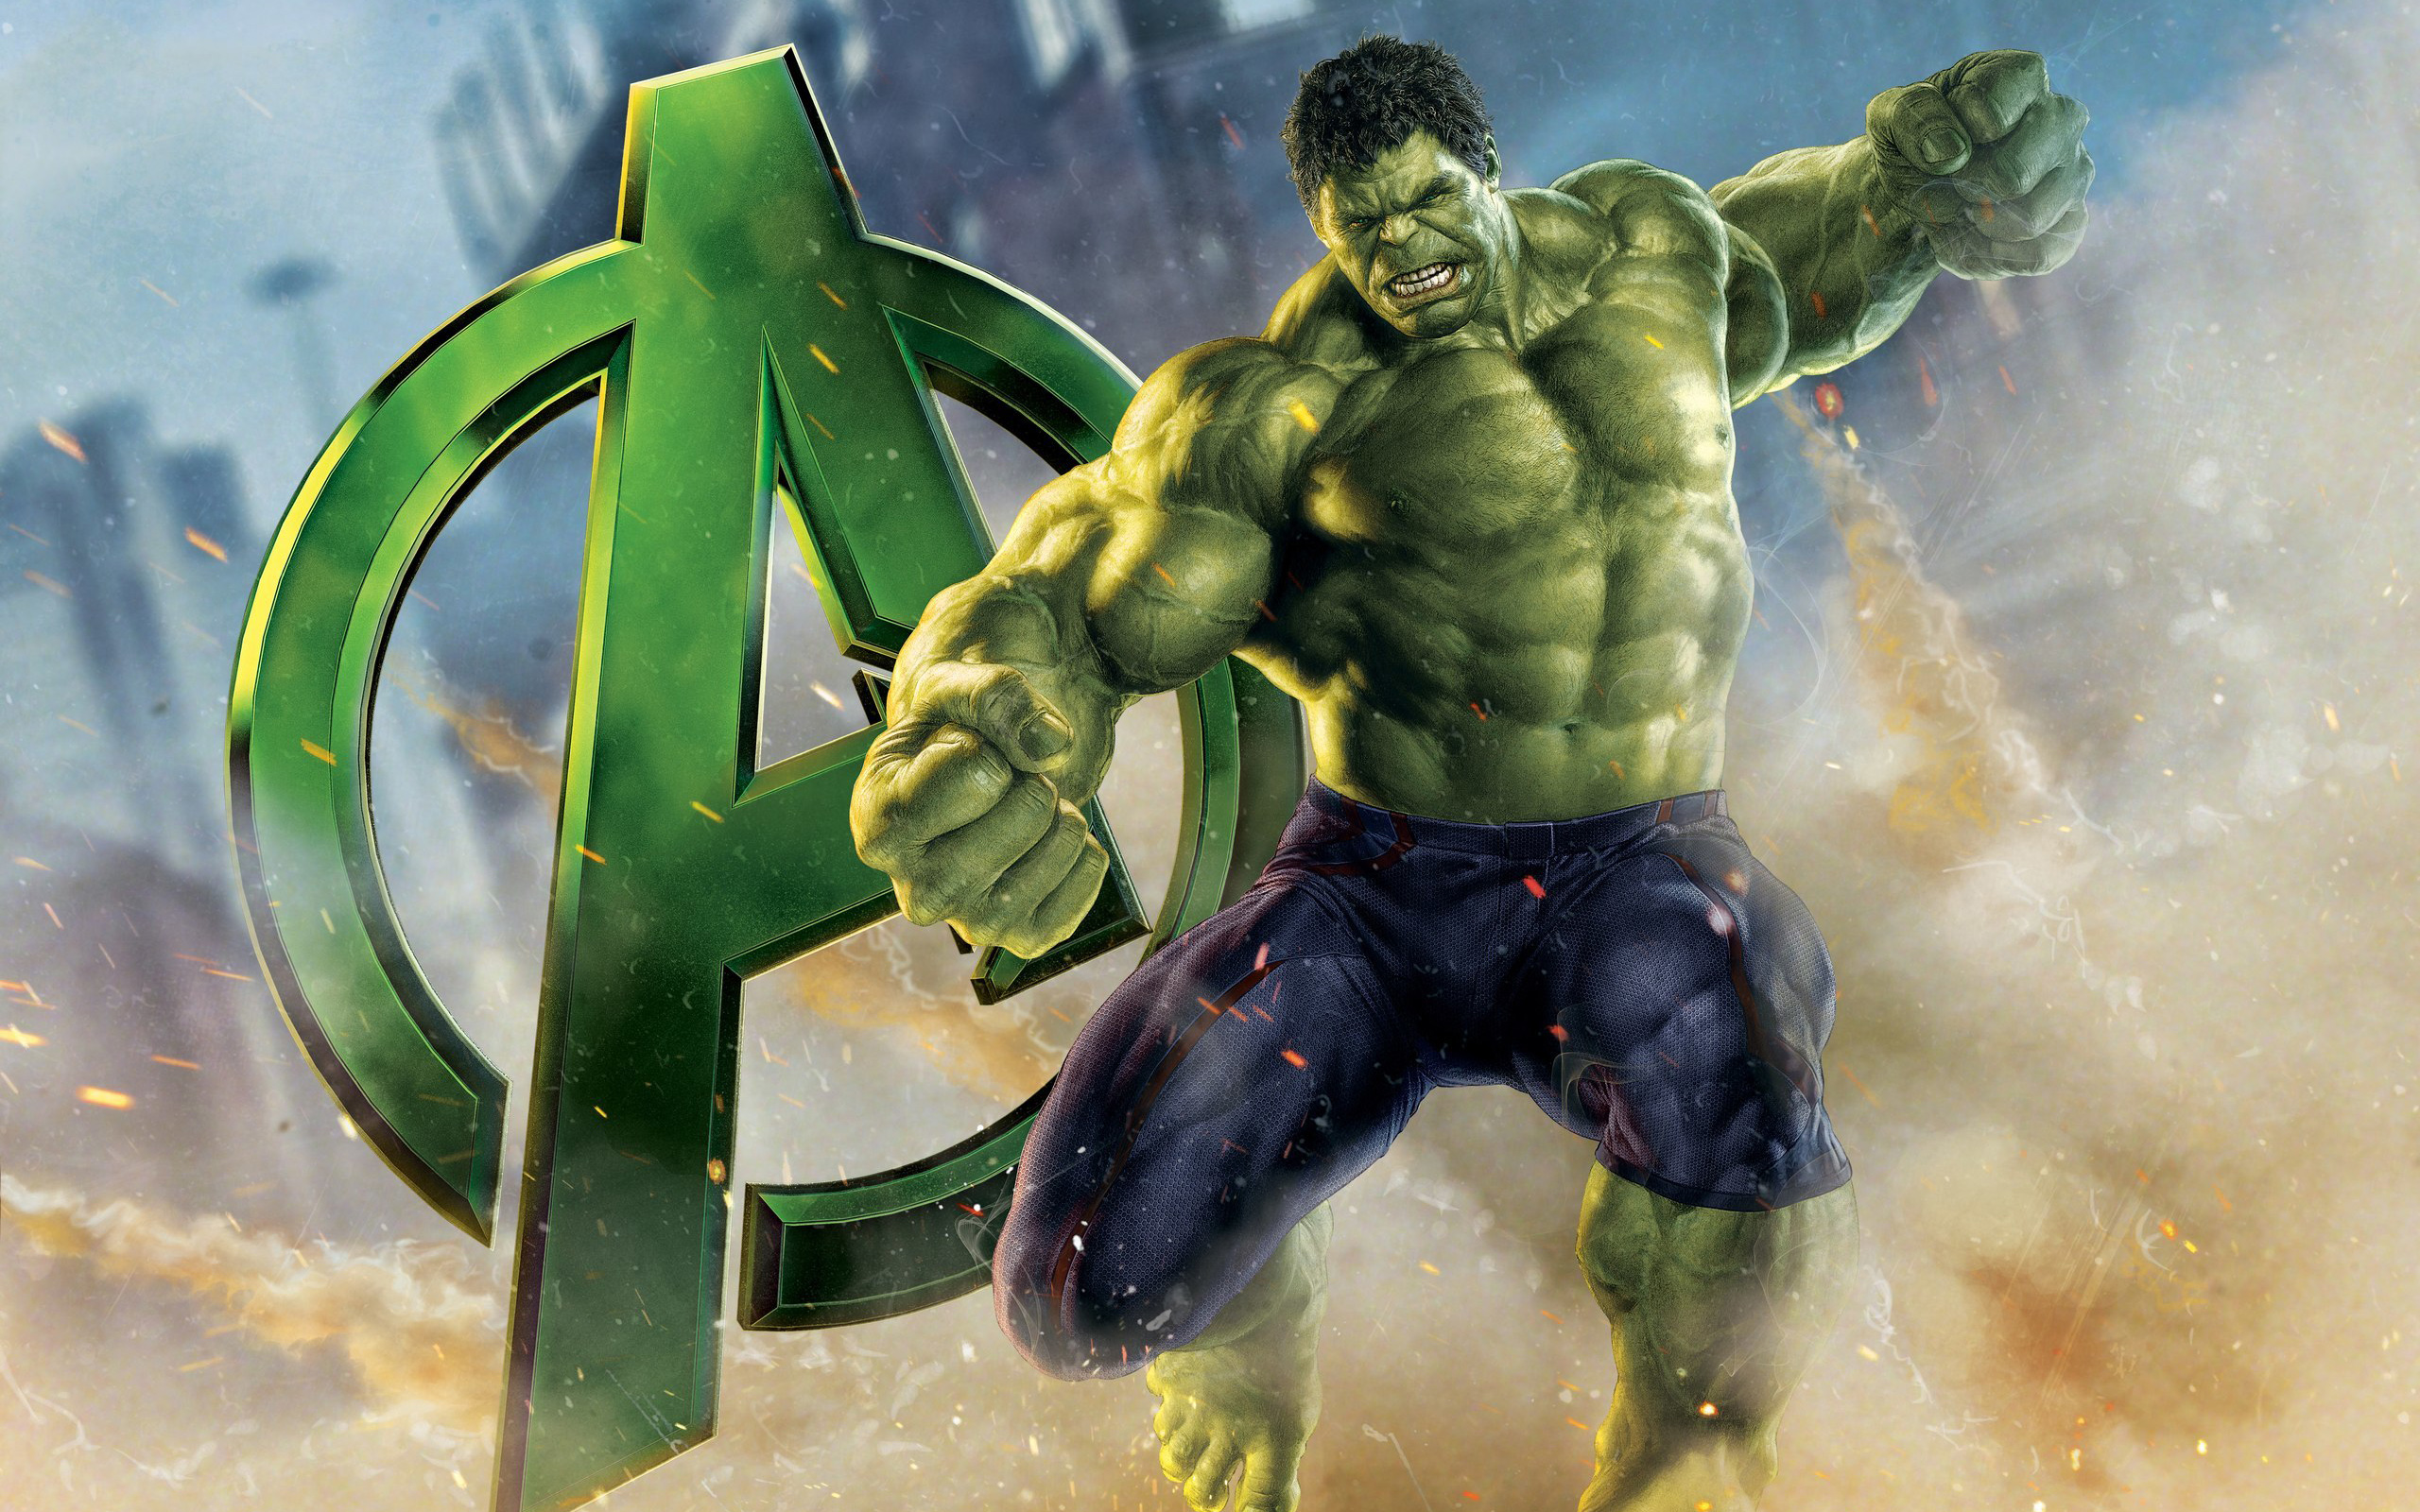 Avengers Hulk Wallpapers HD Wallpapers 2560x1600